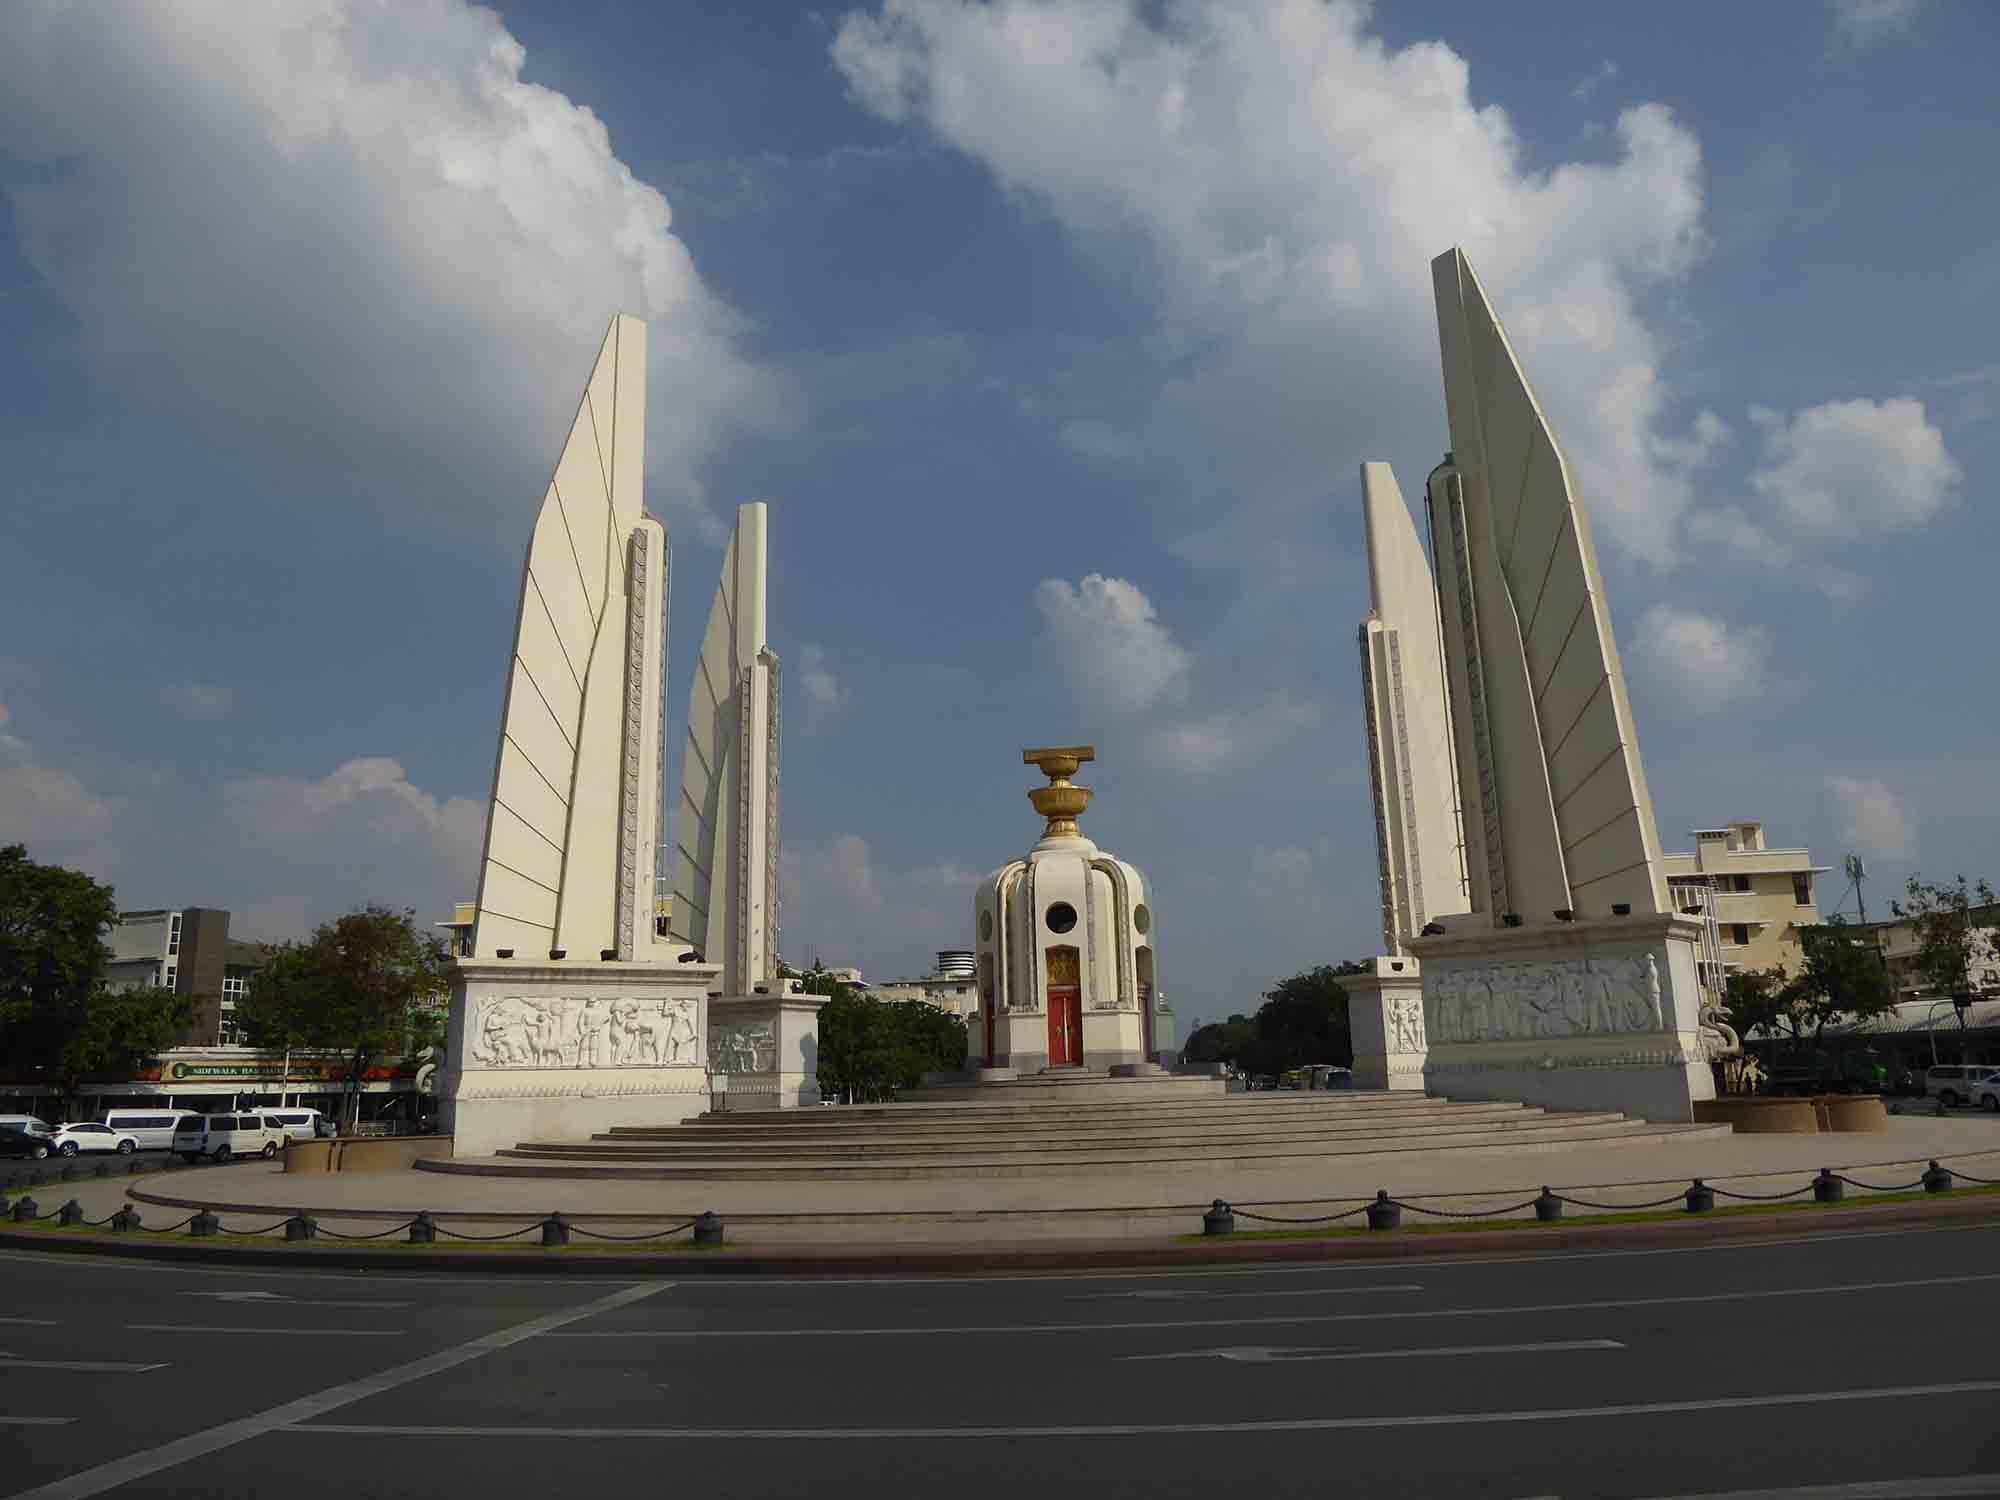 Democracy Monument - Landmarks & Monuments